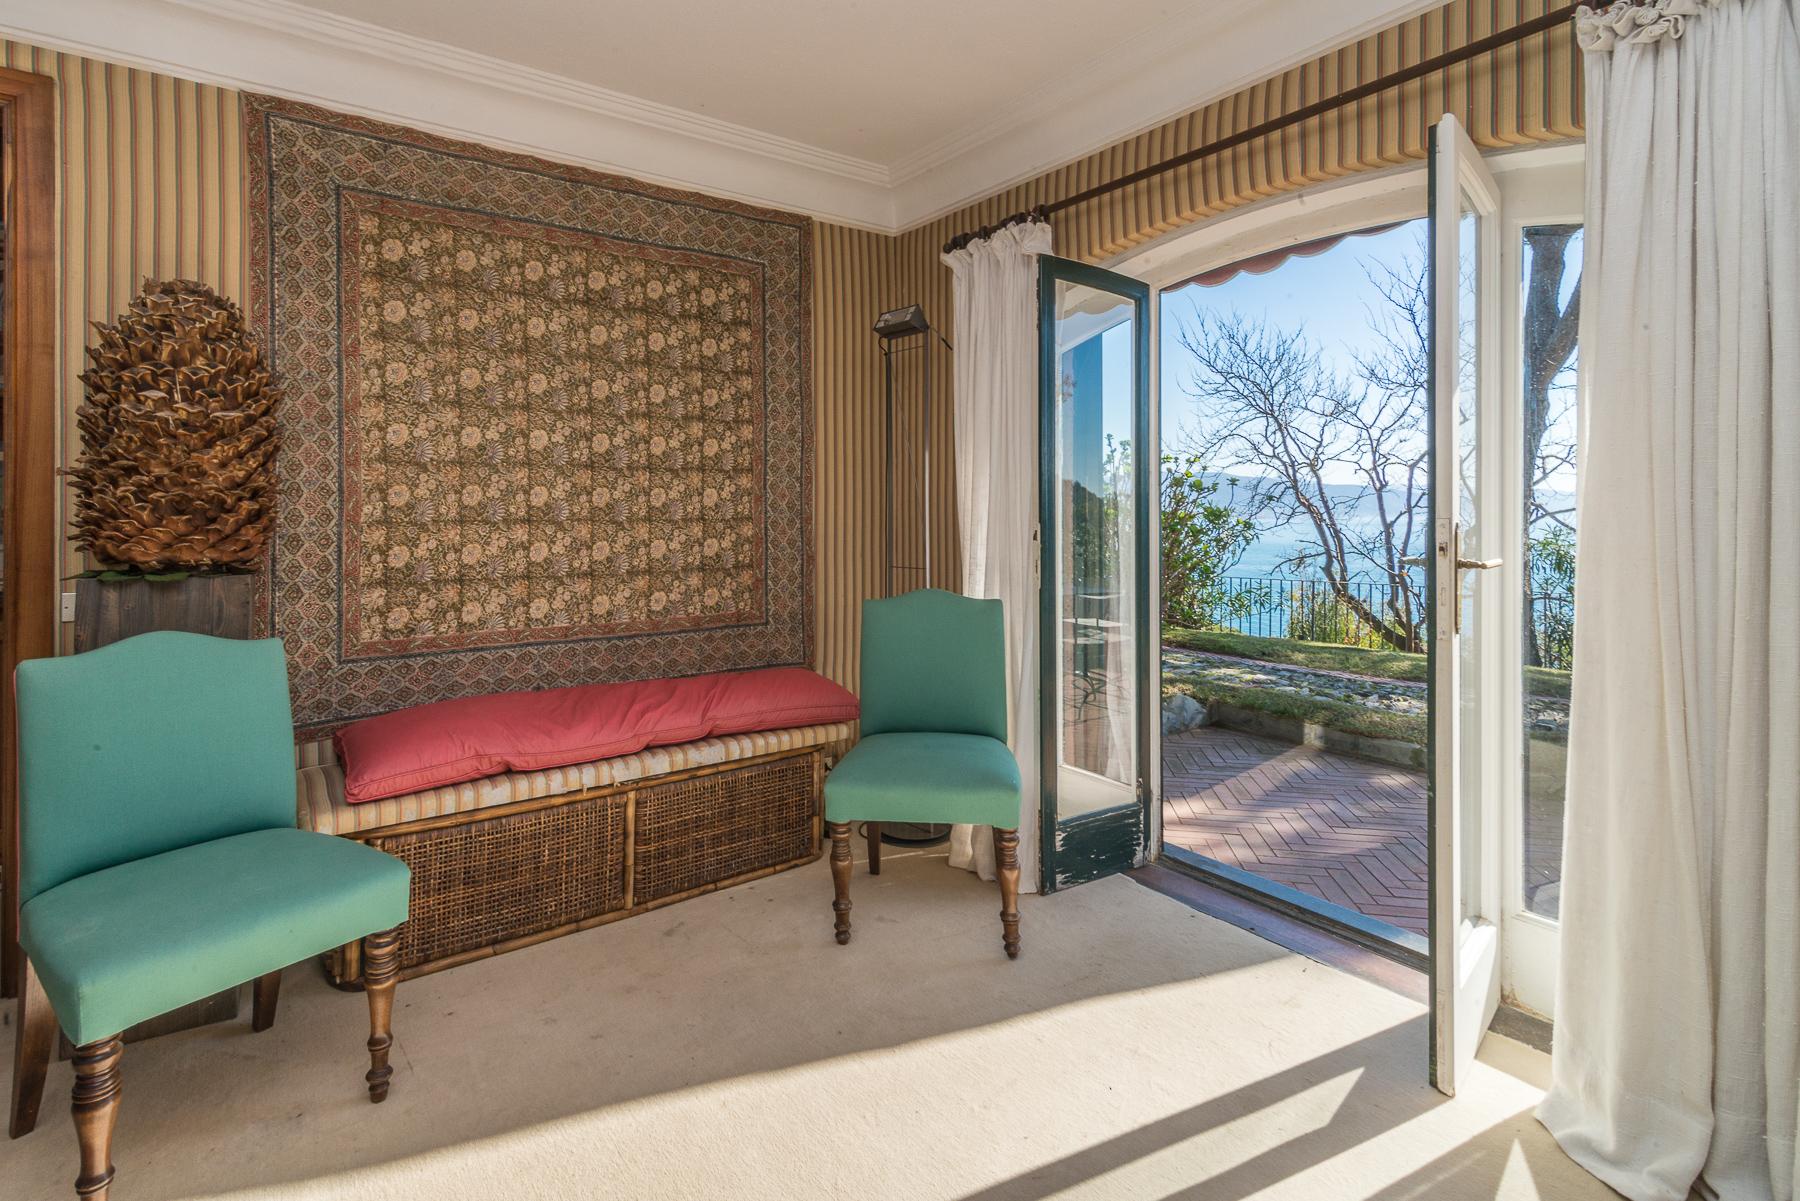 Villa in Vendita a Santa Margherita Ligure: 5 locali, 440 mq - Foto 26